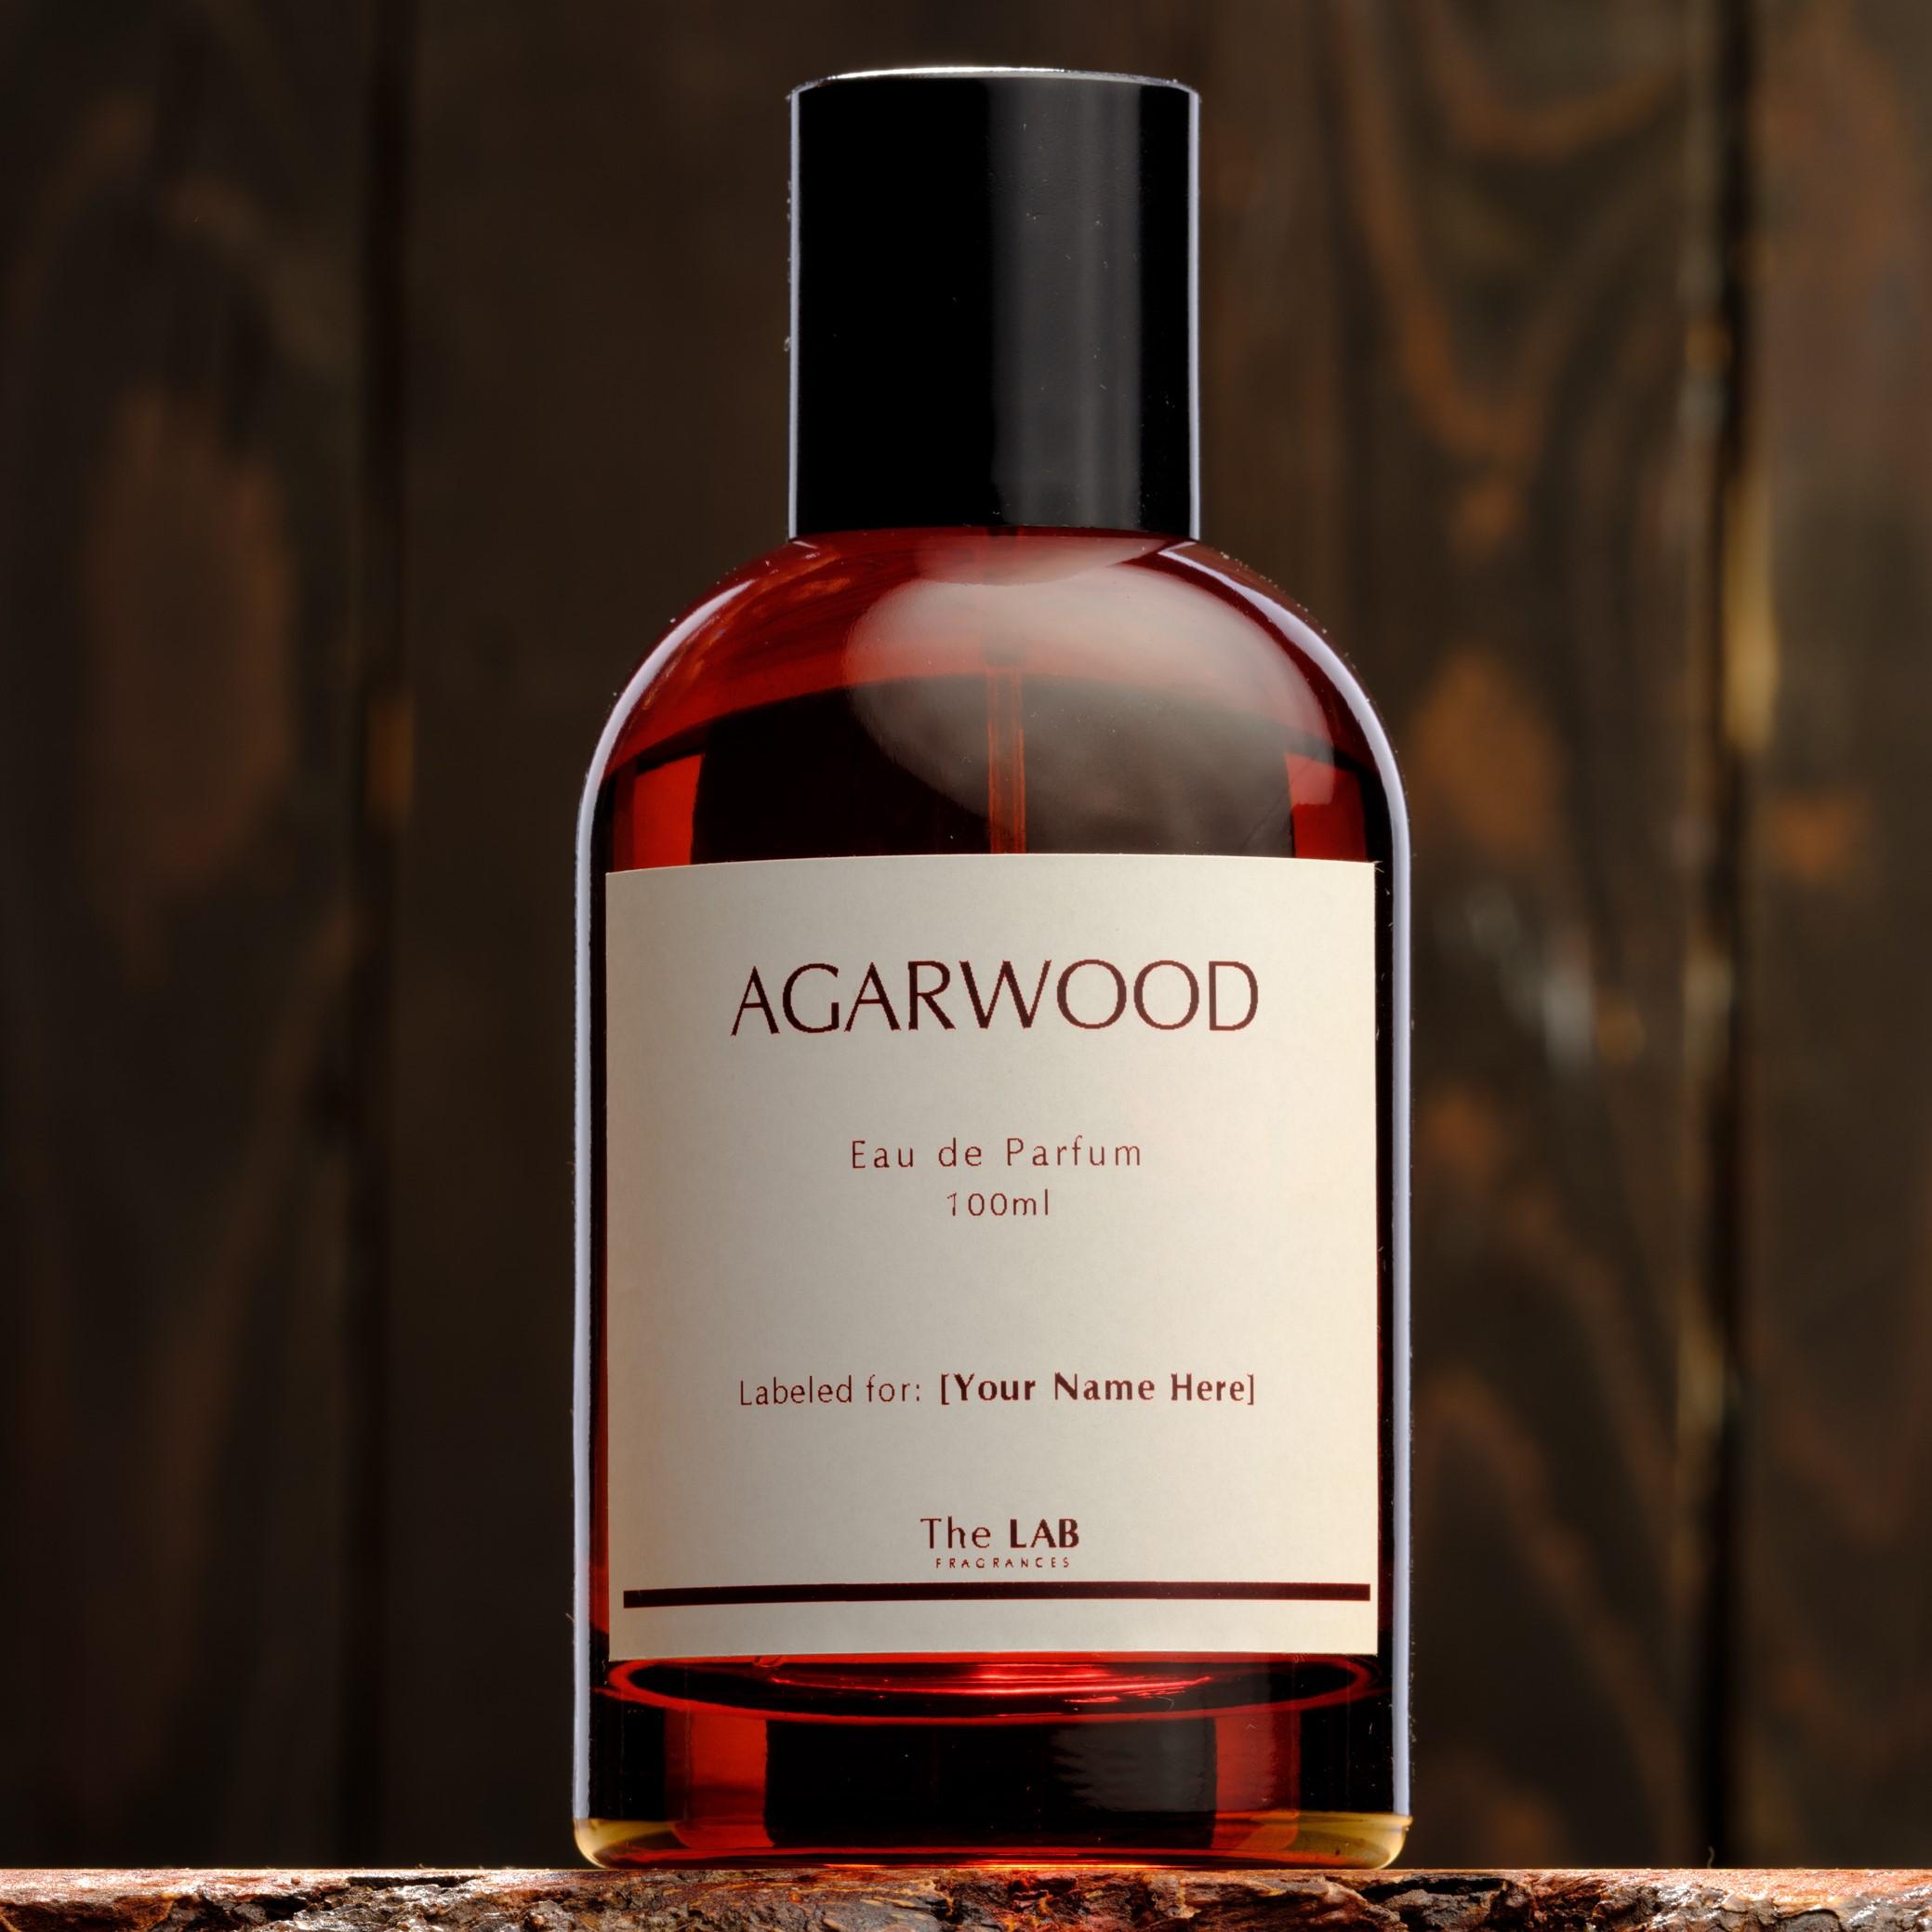 The_LAB_Fragrances Agarwood Eau De Parfum.jpg